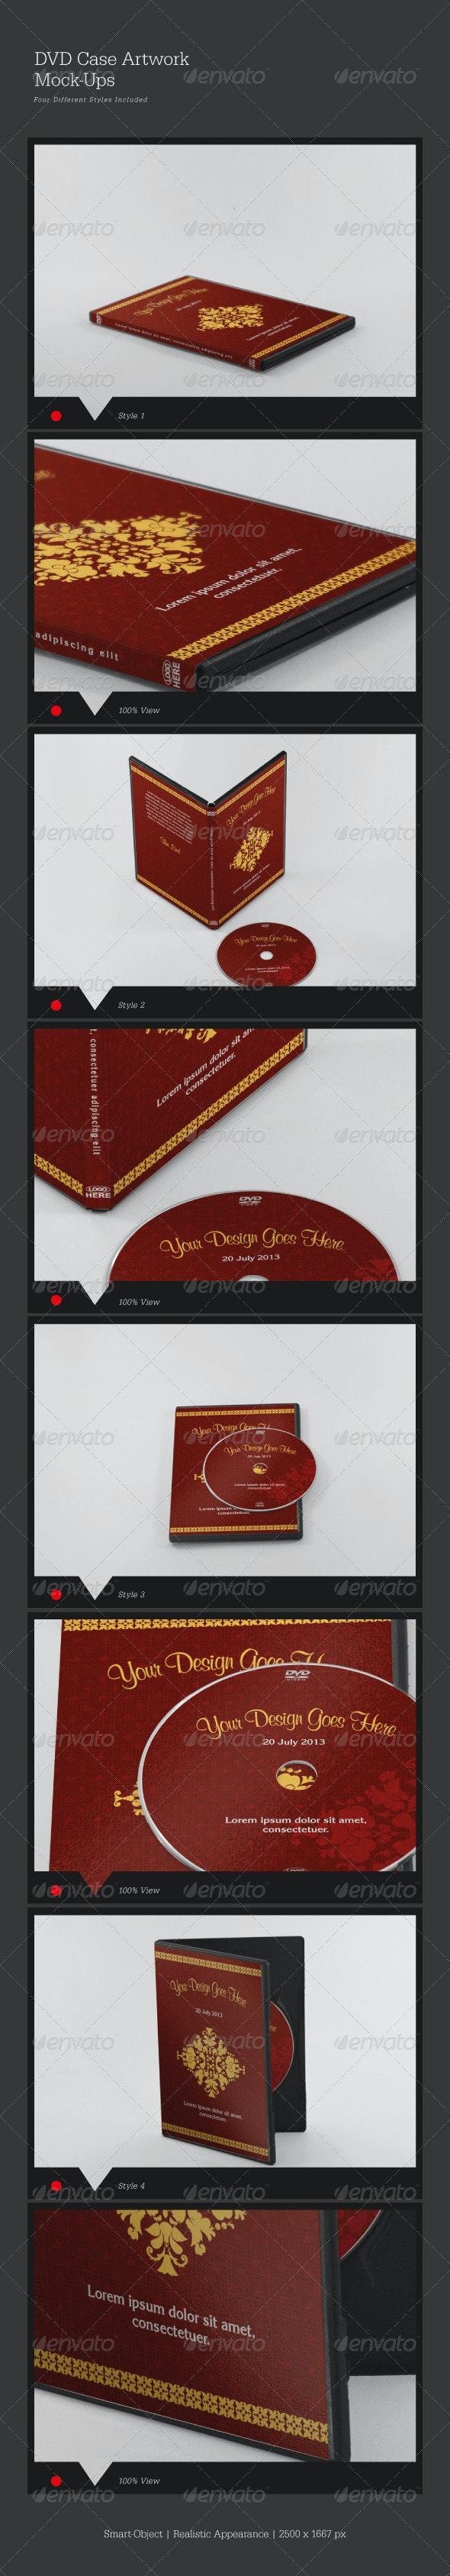 DVD Case Artwork Mock-Ups - Print Product Mock-Ups